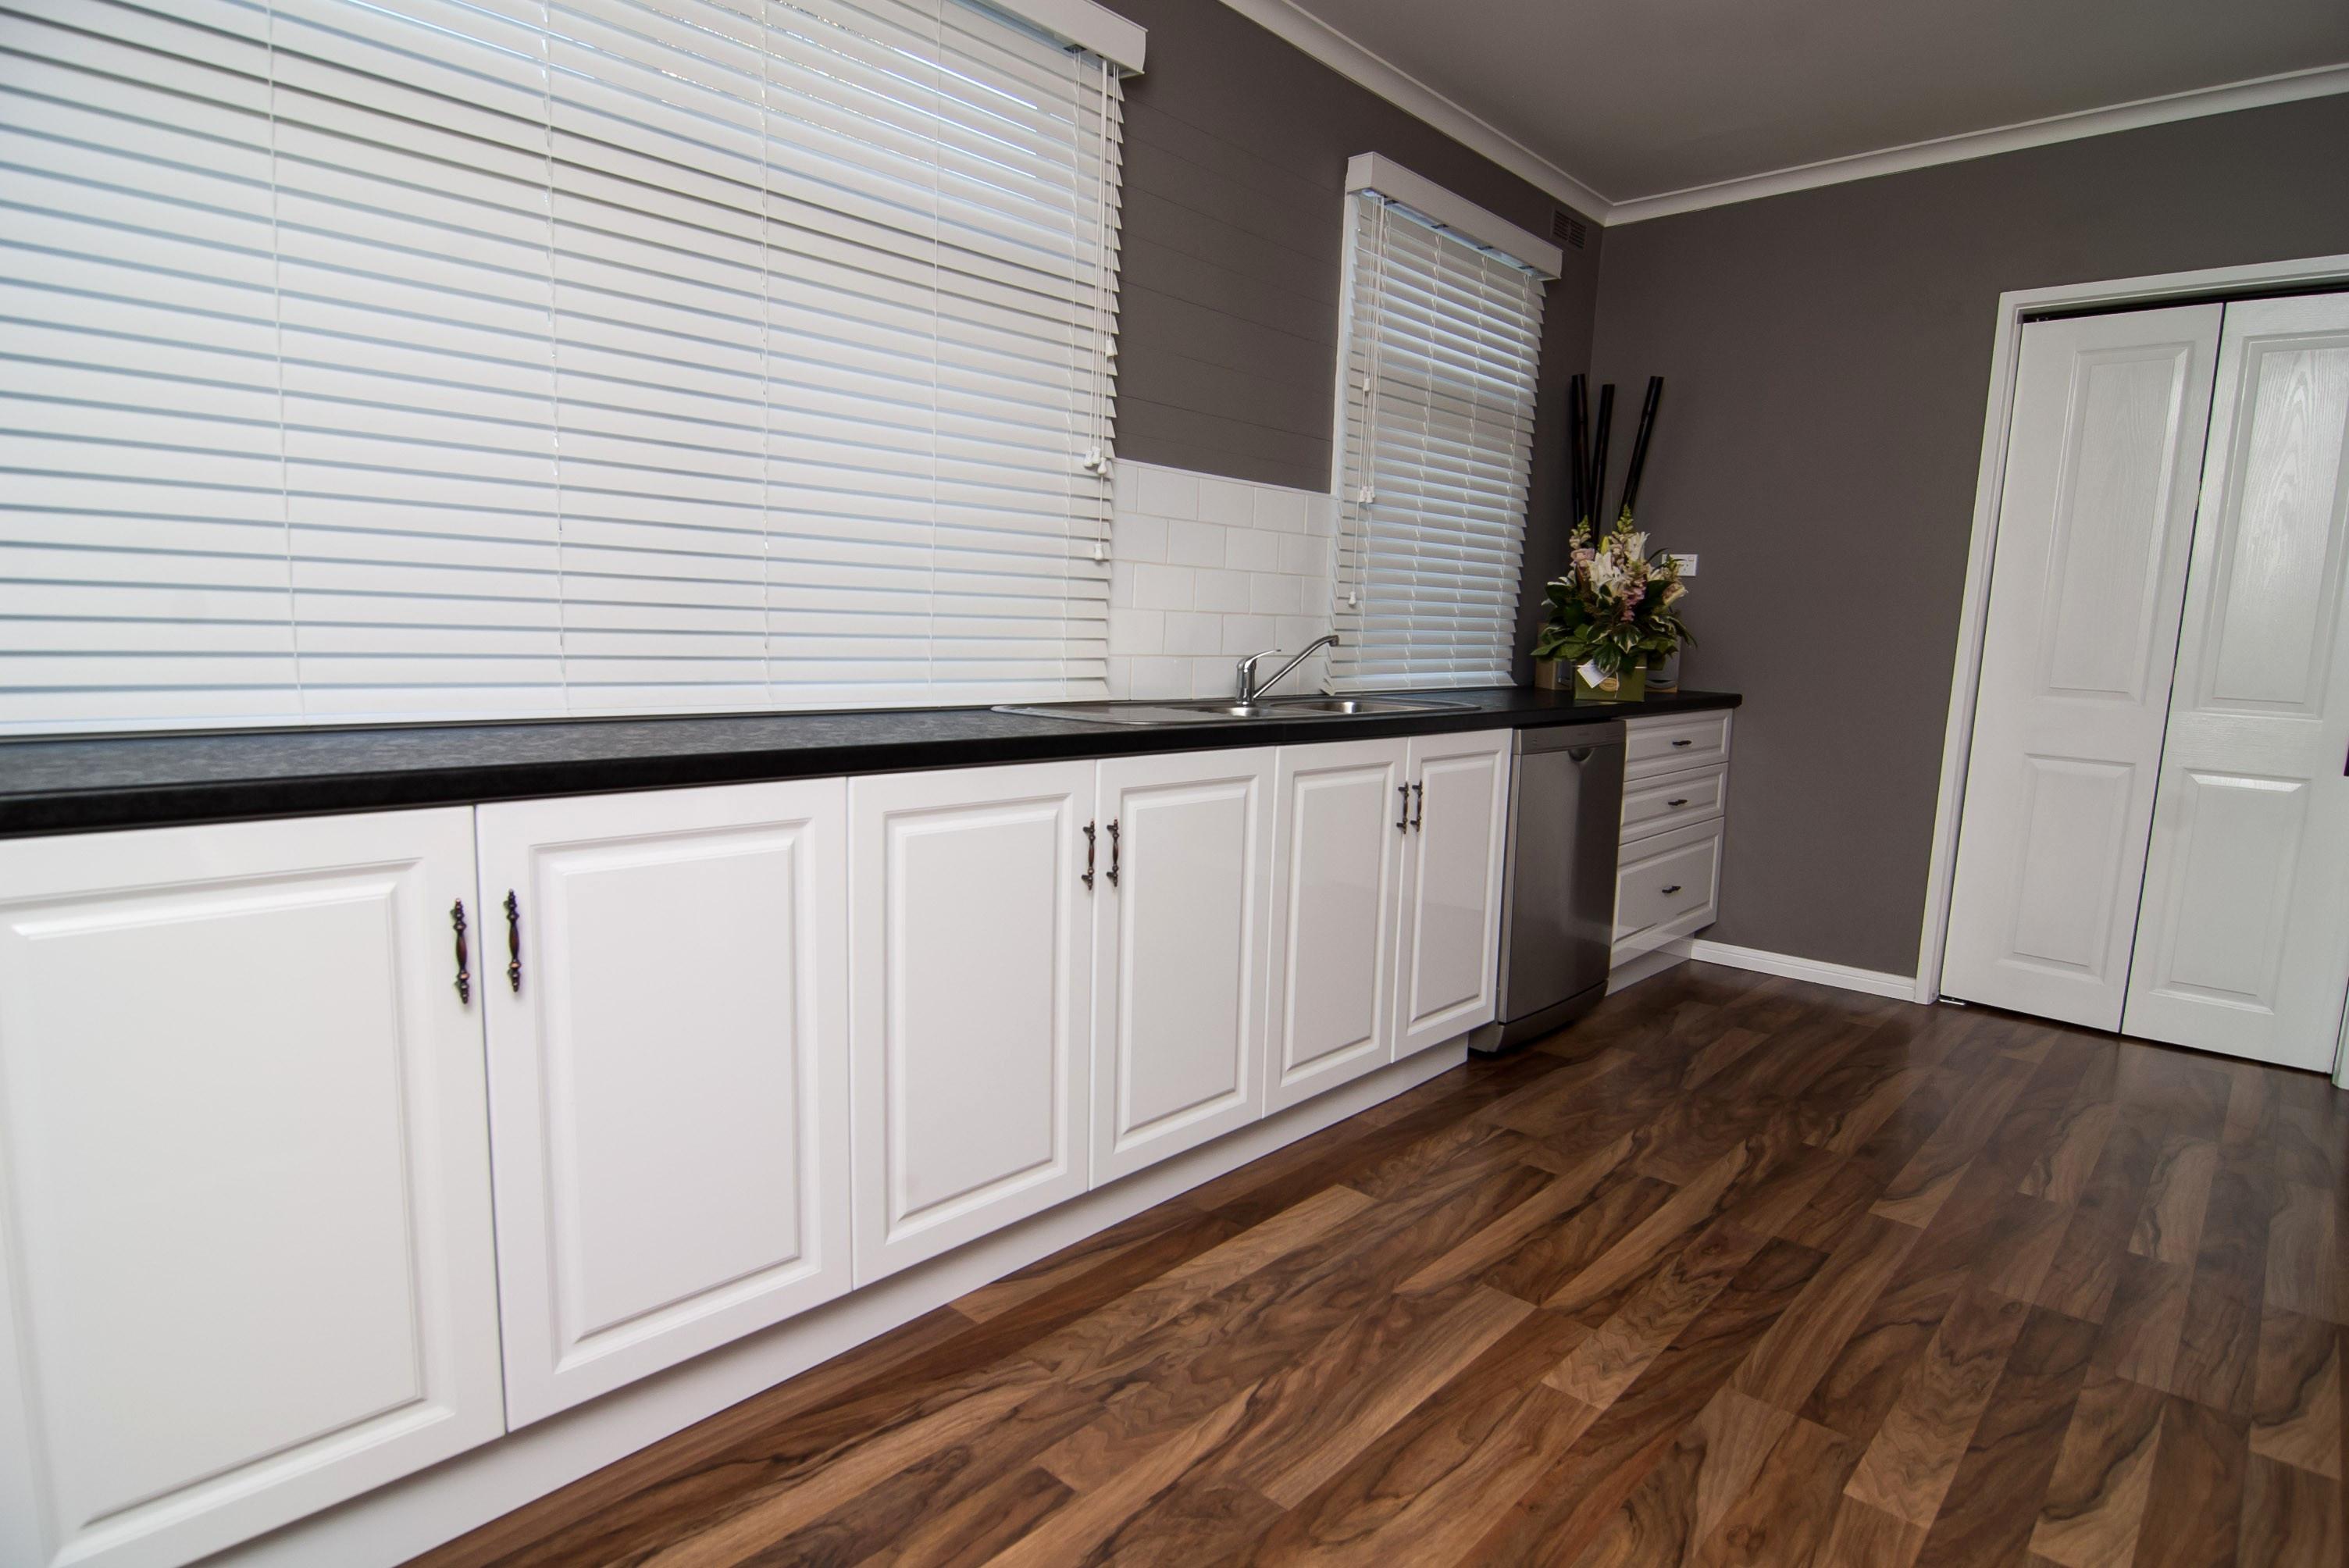 bruce hardwood laminate flooring of kitchen with wood floors new interior amazing bruce wood flooring within kitchen with wood floors fresh 10 fresh kitchen cabinet faces